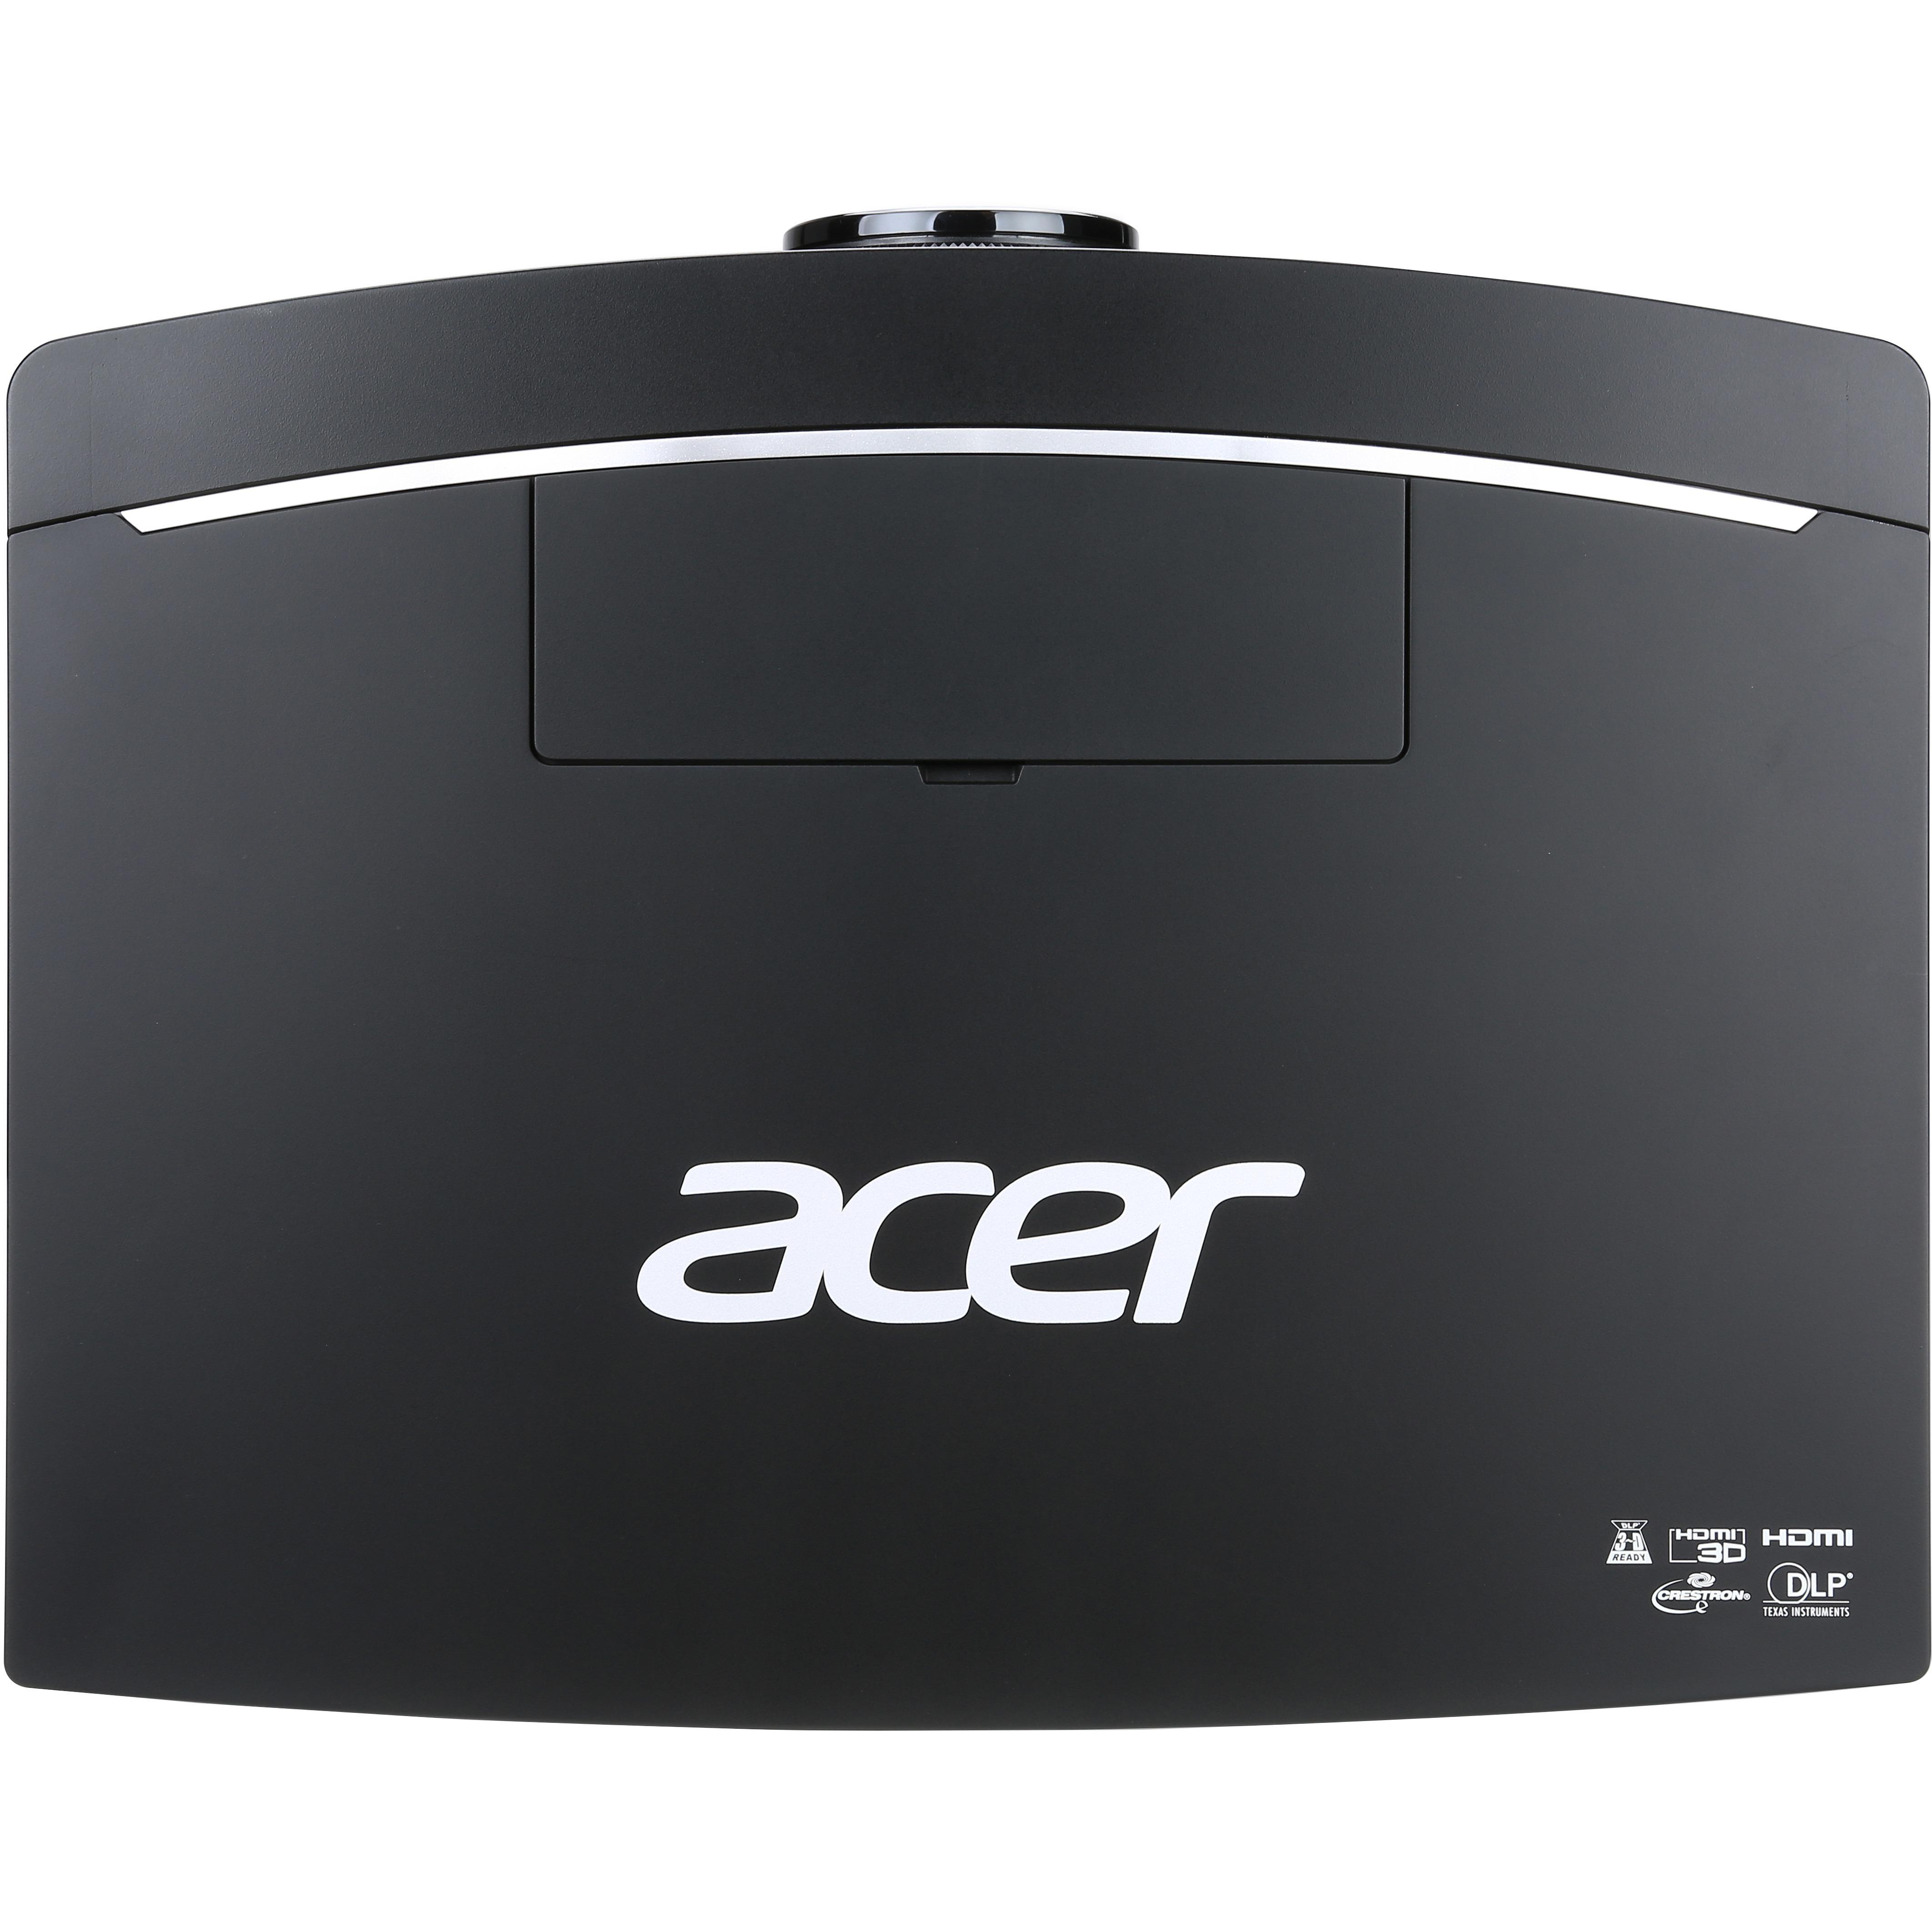 Acer F7200 DLP Projector - HDTV - 4:3